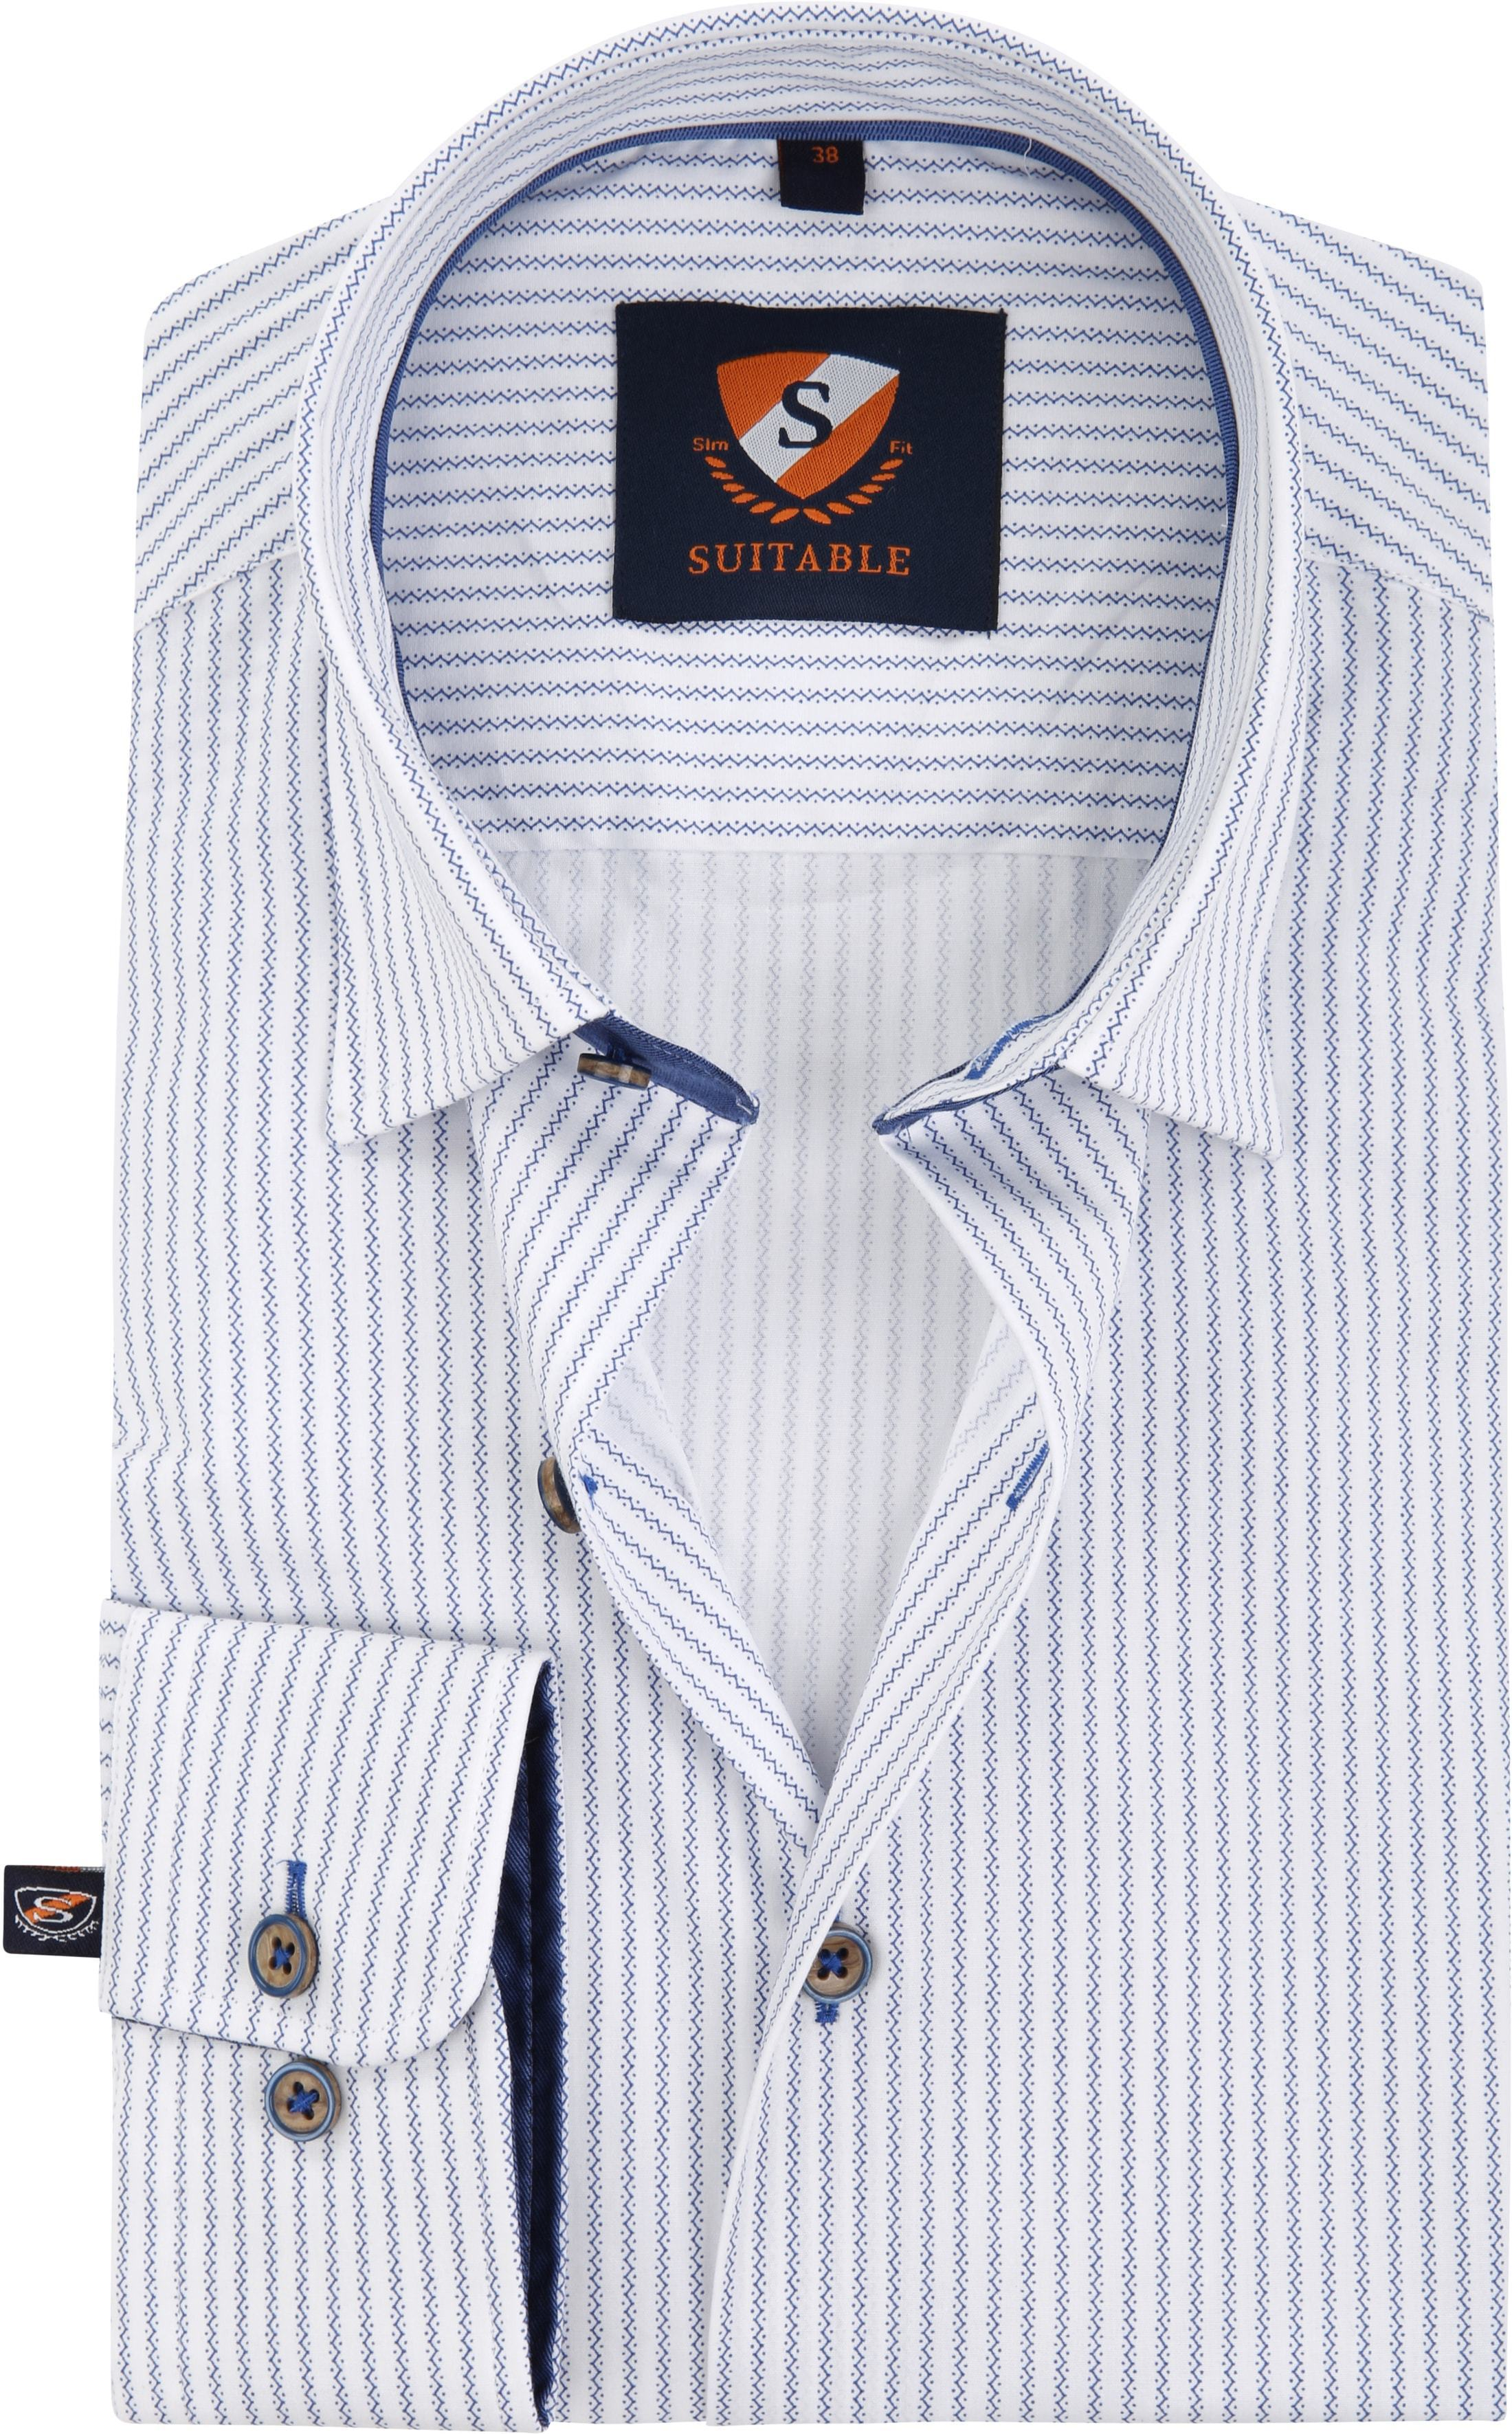 792a6f27e8d4 Suitable Shirt Print Stripe 184-4 HBD Print Stripe order online ...